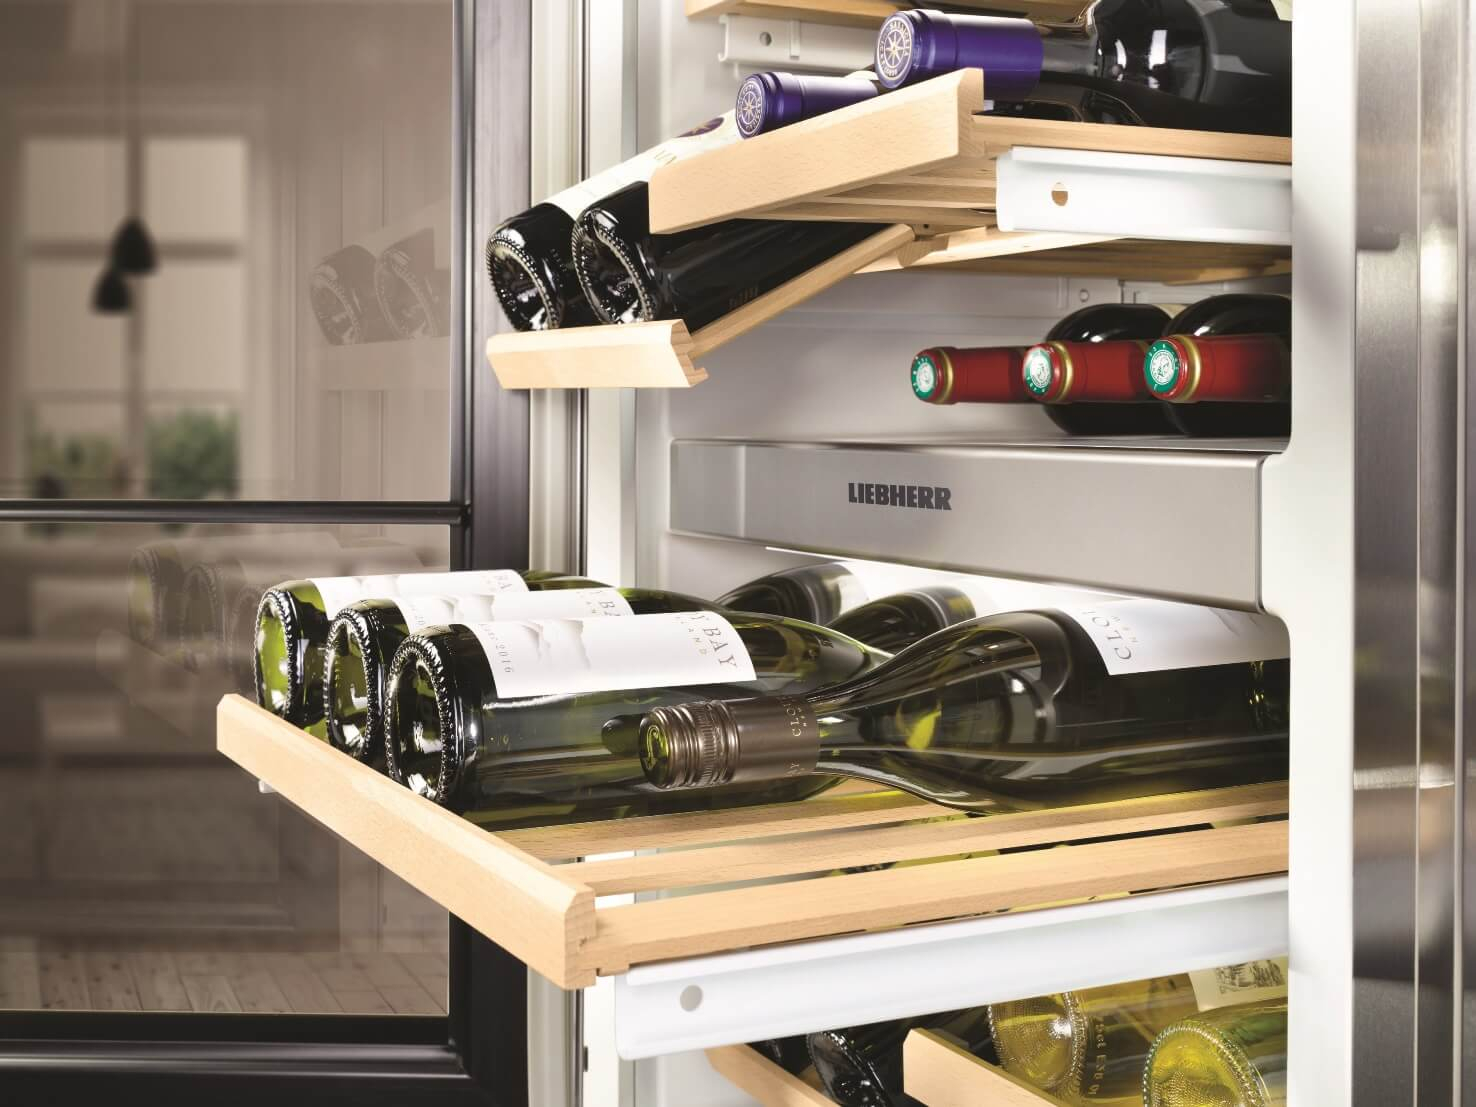 купить Side-by-Side холодильник Liebherr SBSes 8486 Украина фото 12